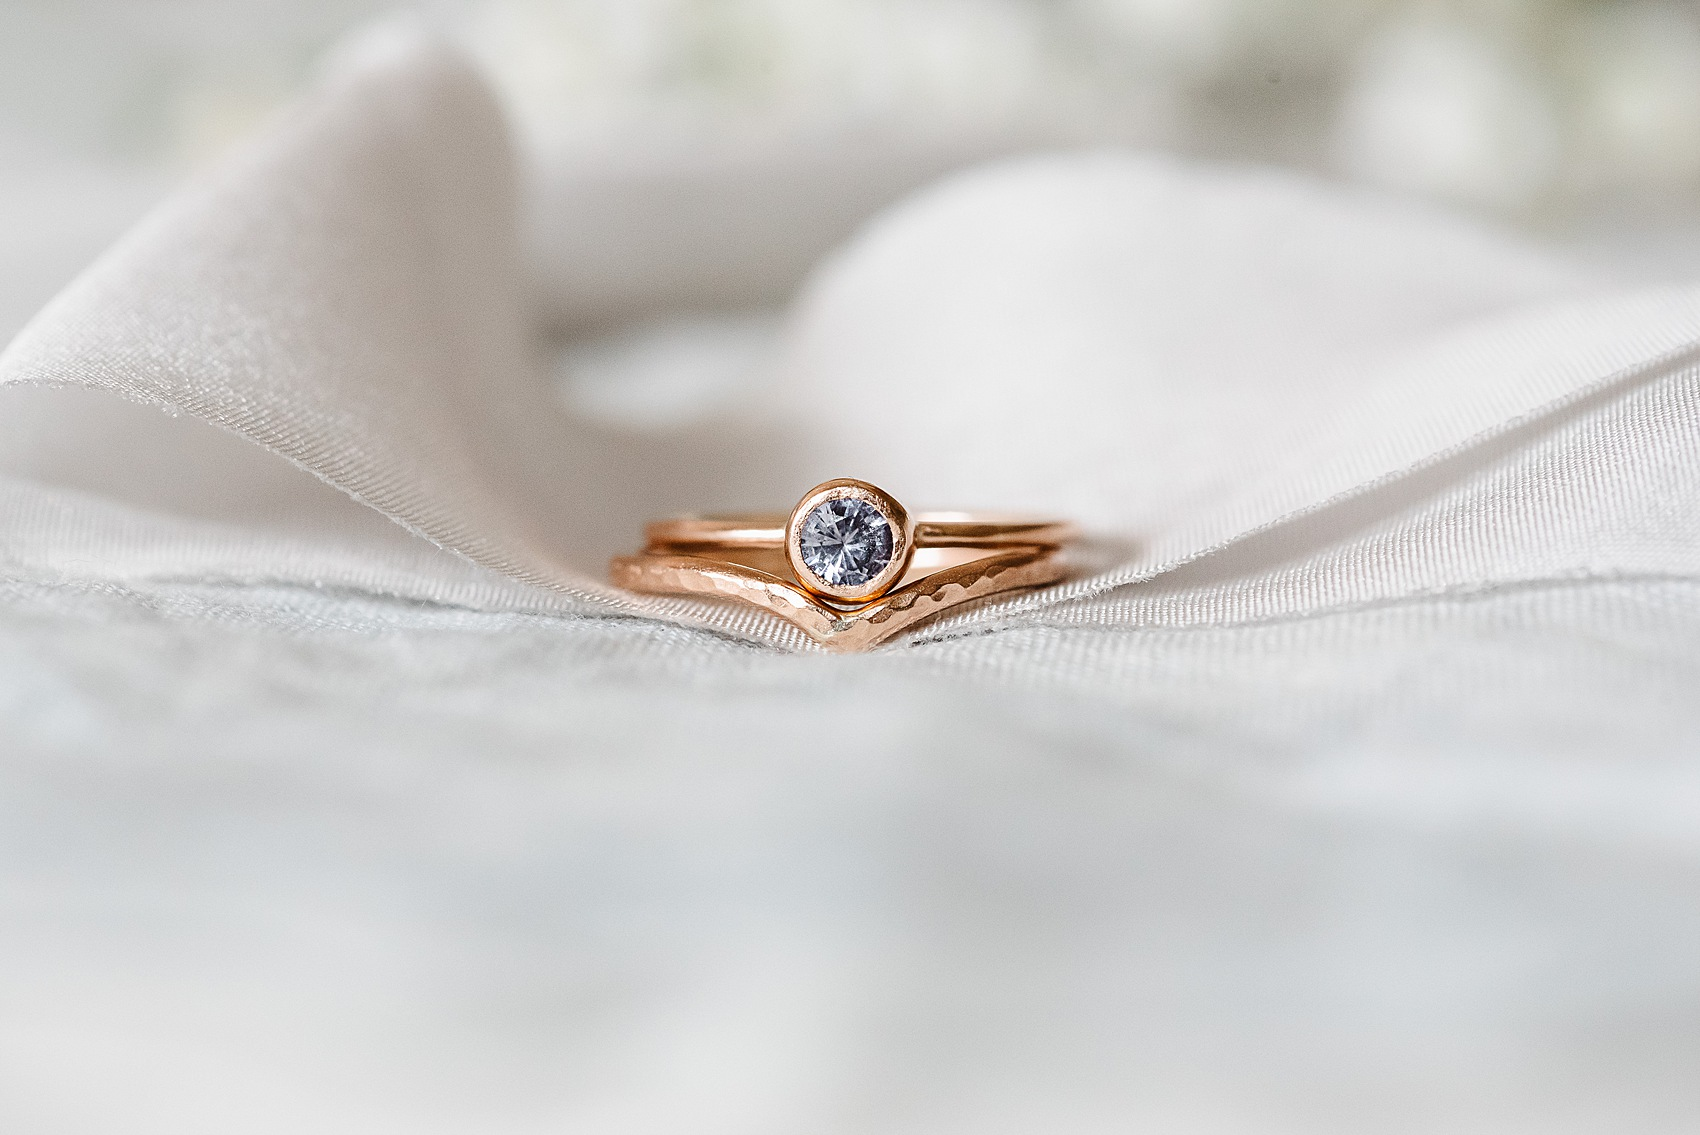 Sanrio Hello Kitty 18k Gold Diamond Ring Chow Sang Sang